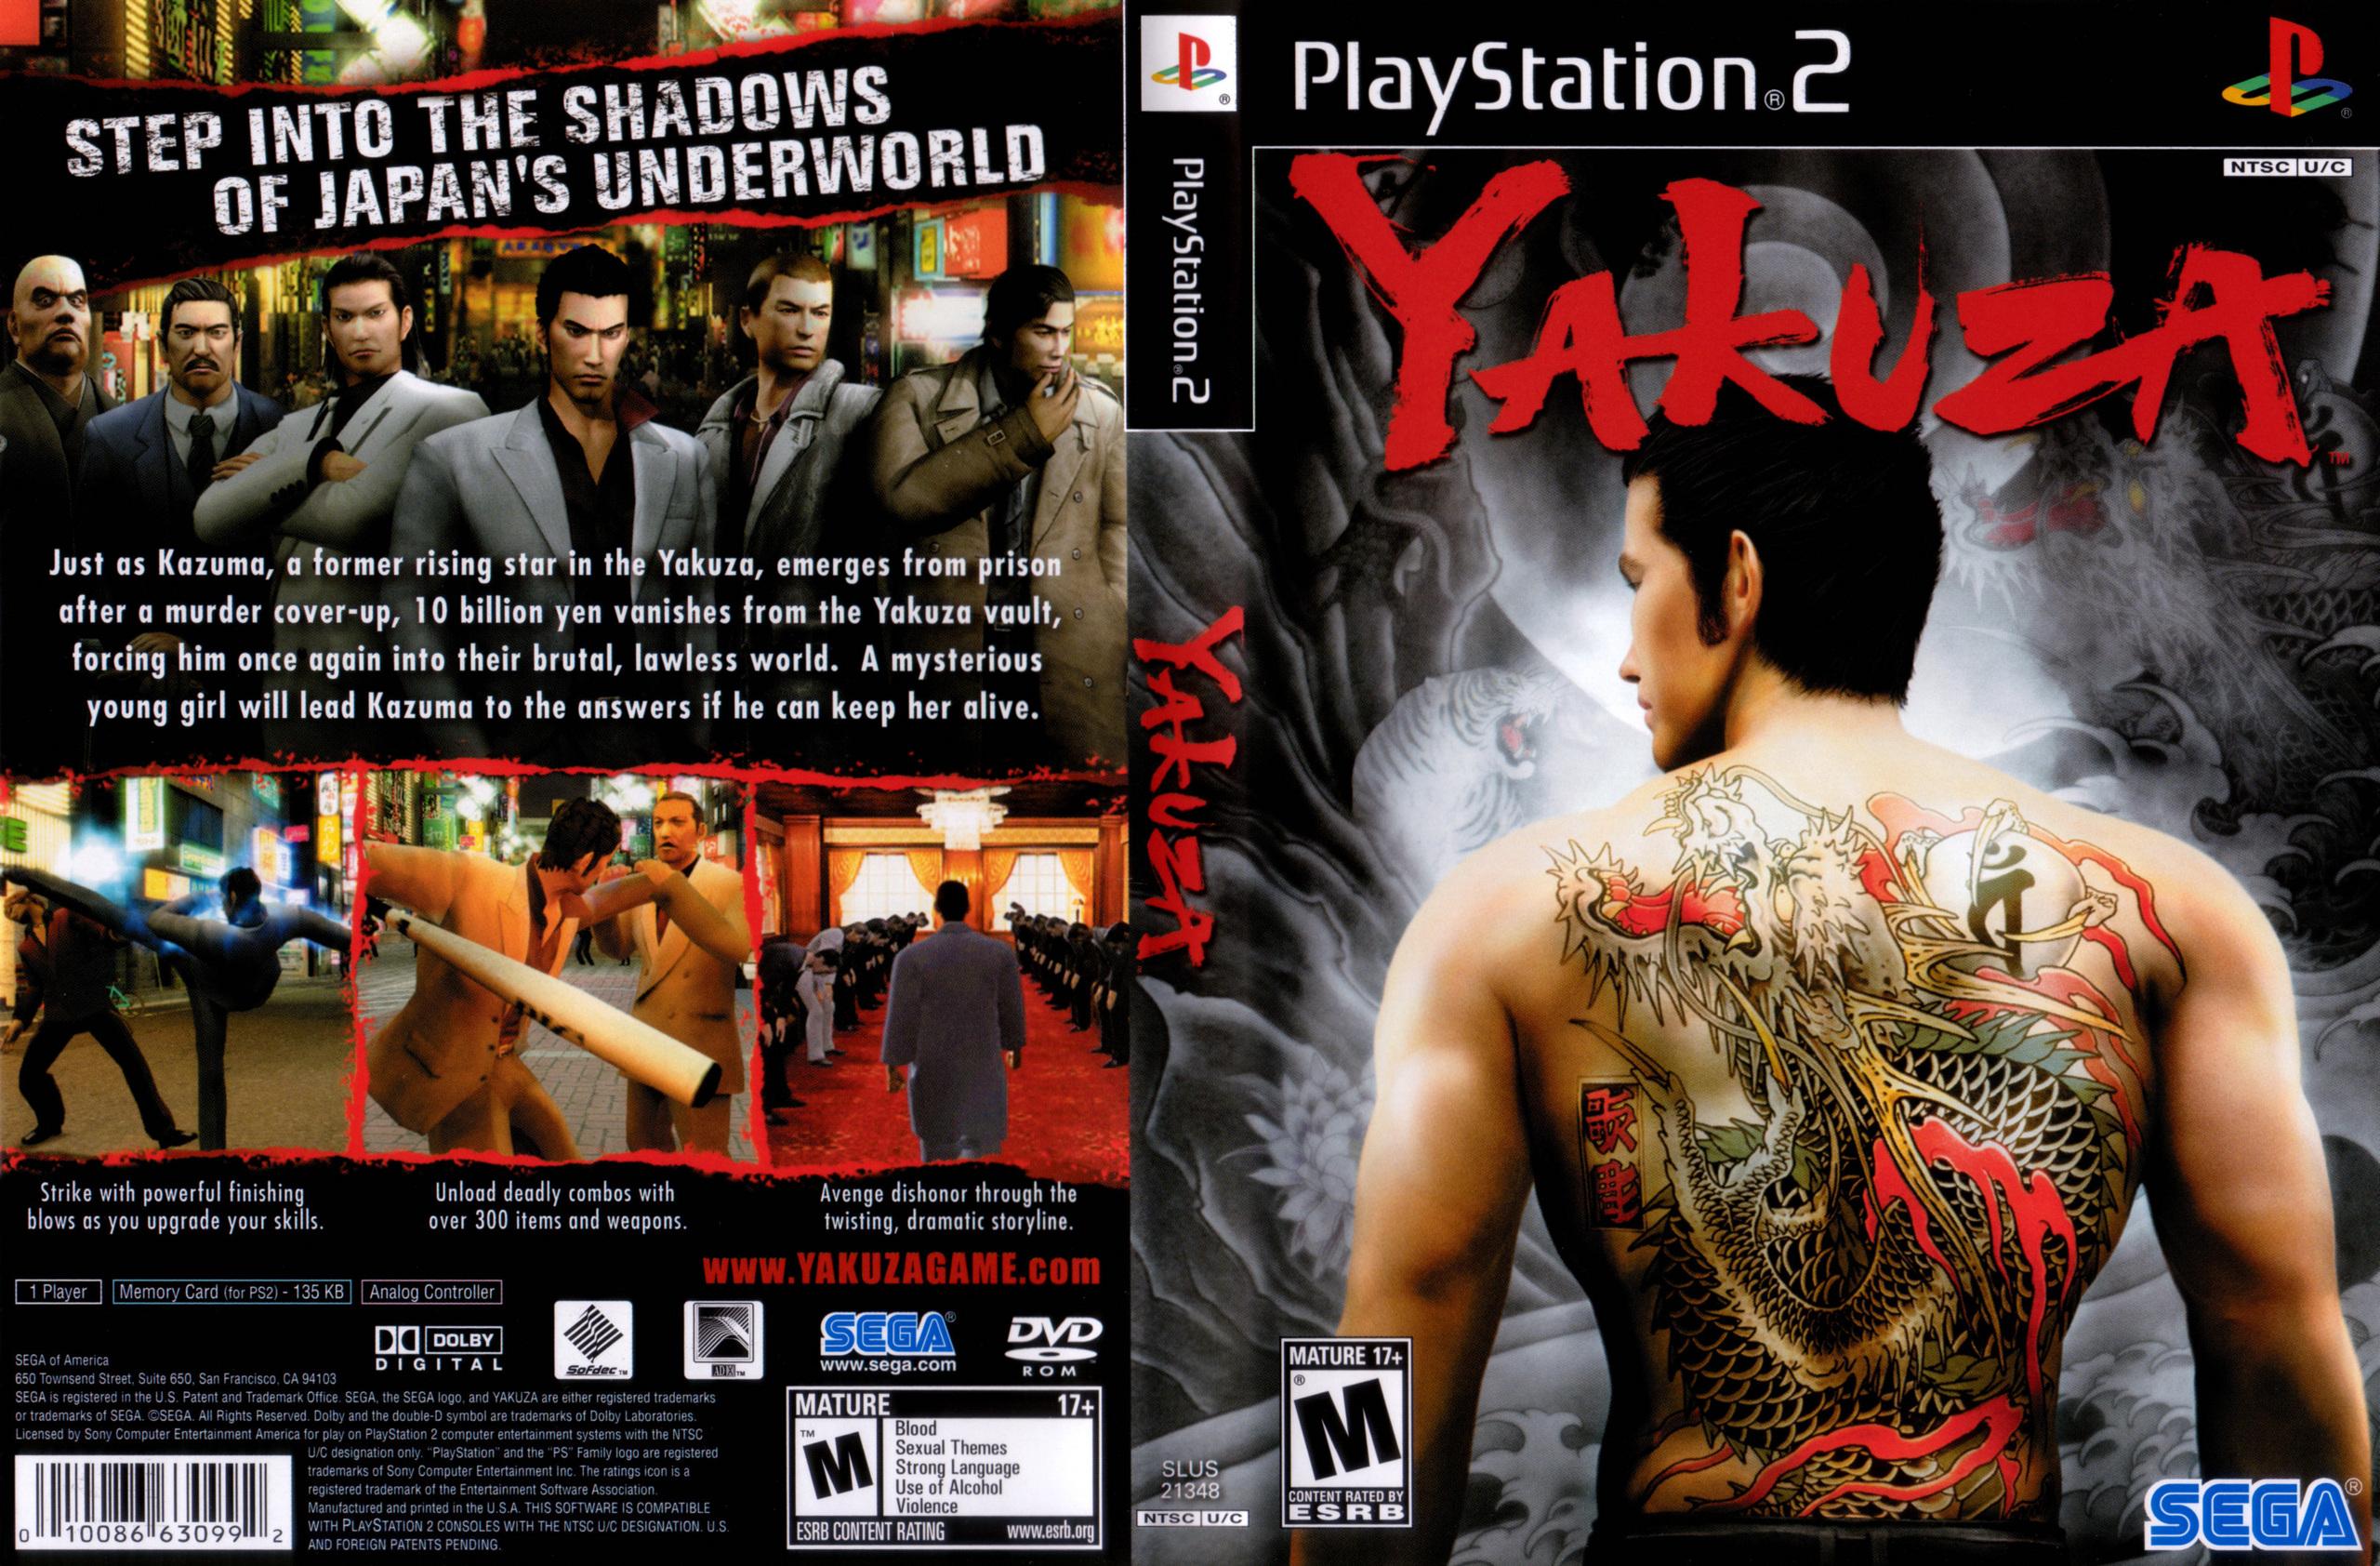 Yakuza Full Cove   Game Ps2 Yakuza Hd Wallpapers backgrounds 2560x1684